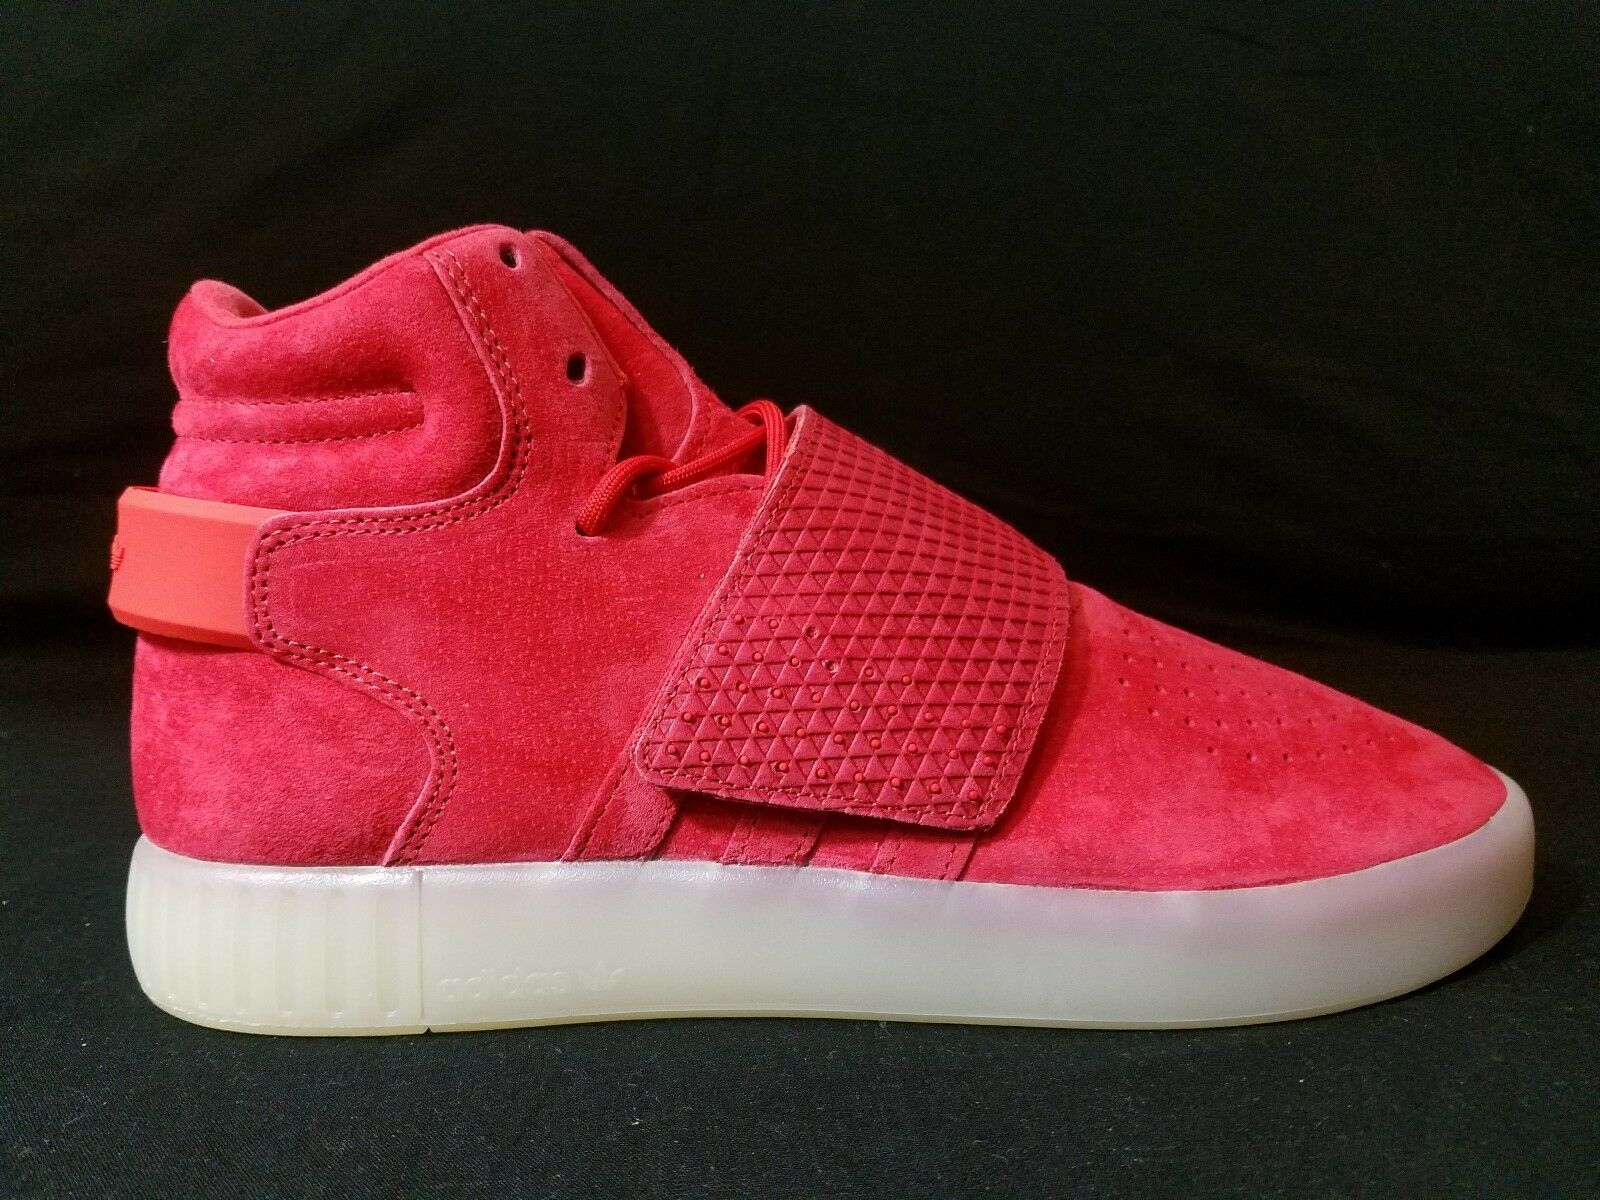 Adidas Originals Rojo hombres invasor tubular Correa Rojo Originals Hi Top Zapatillas - C02 bc1ac1